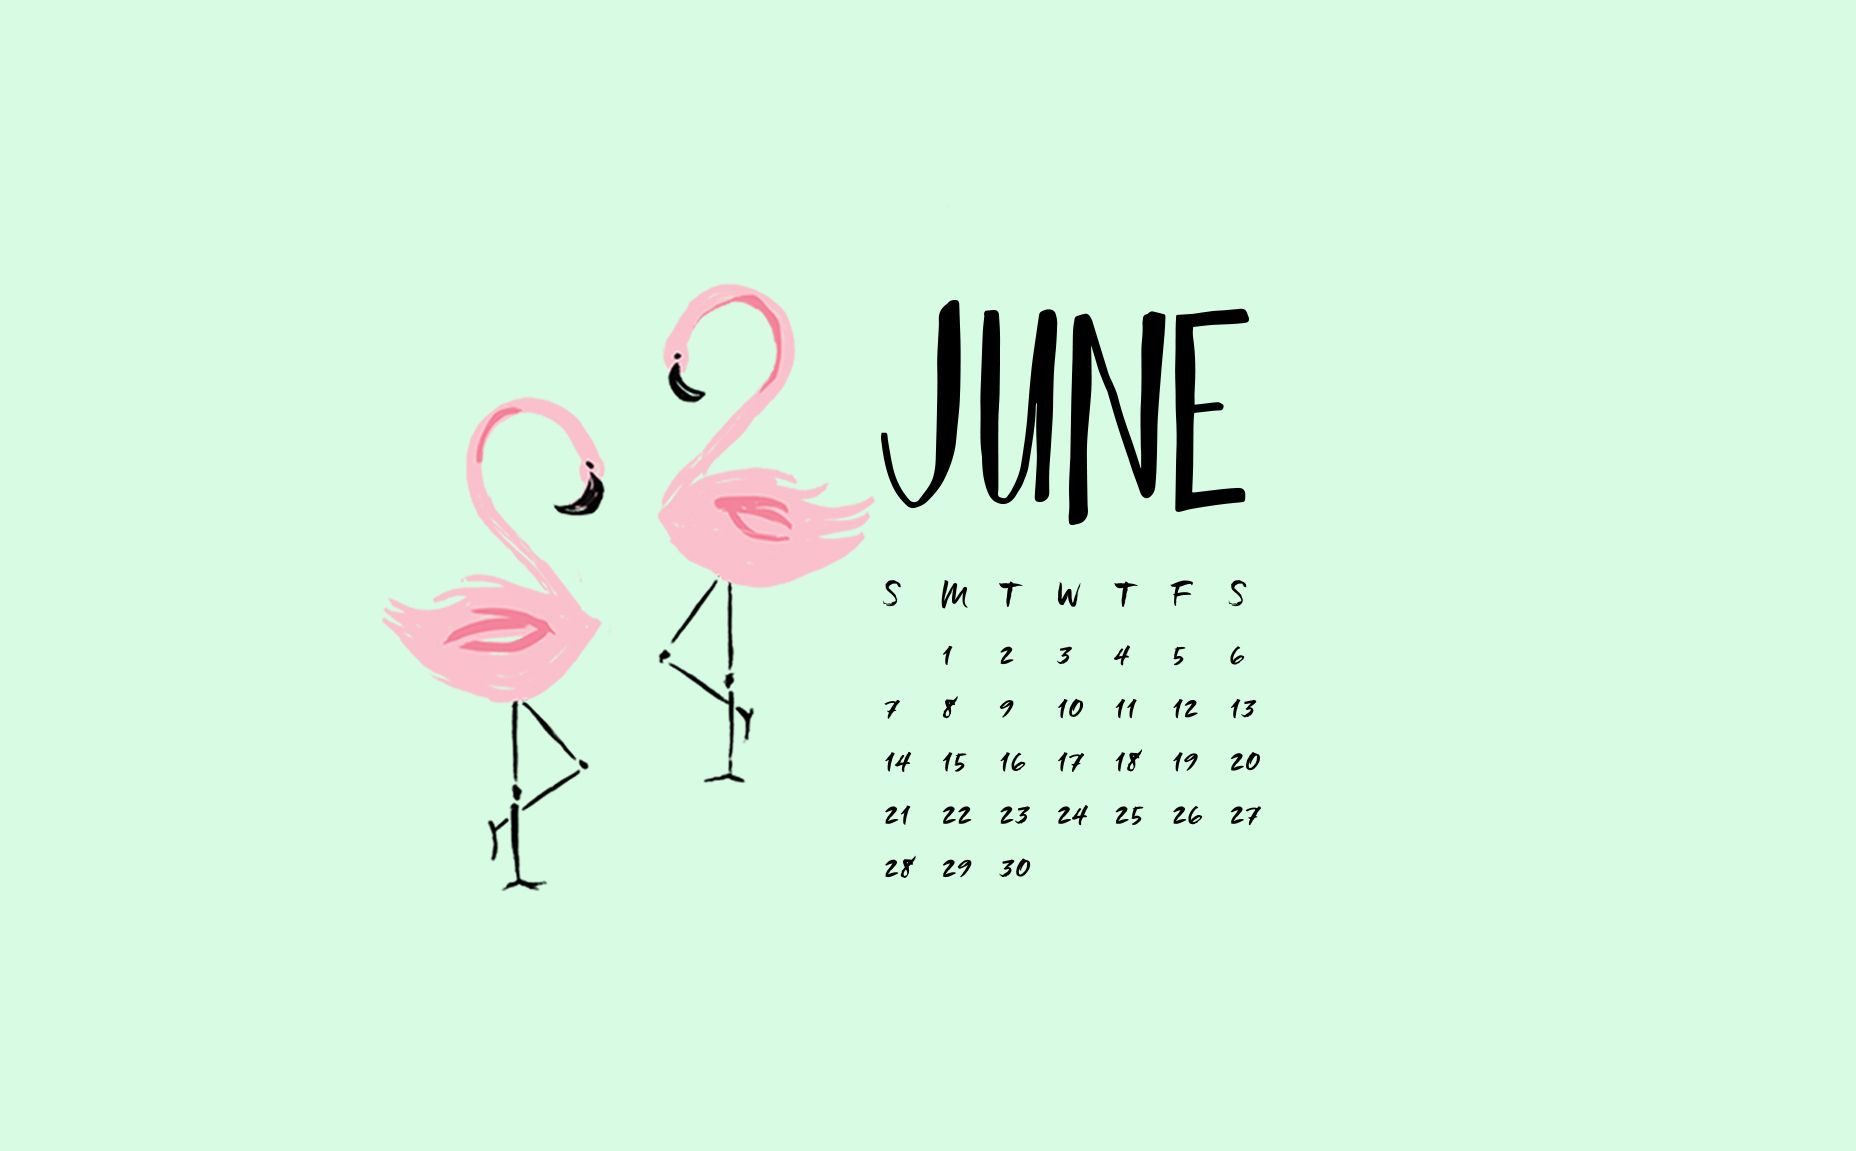 june flamingo phone desktop wallpaper backgrounds by may designs download http